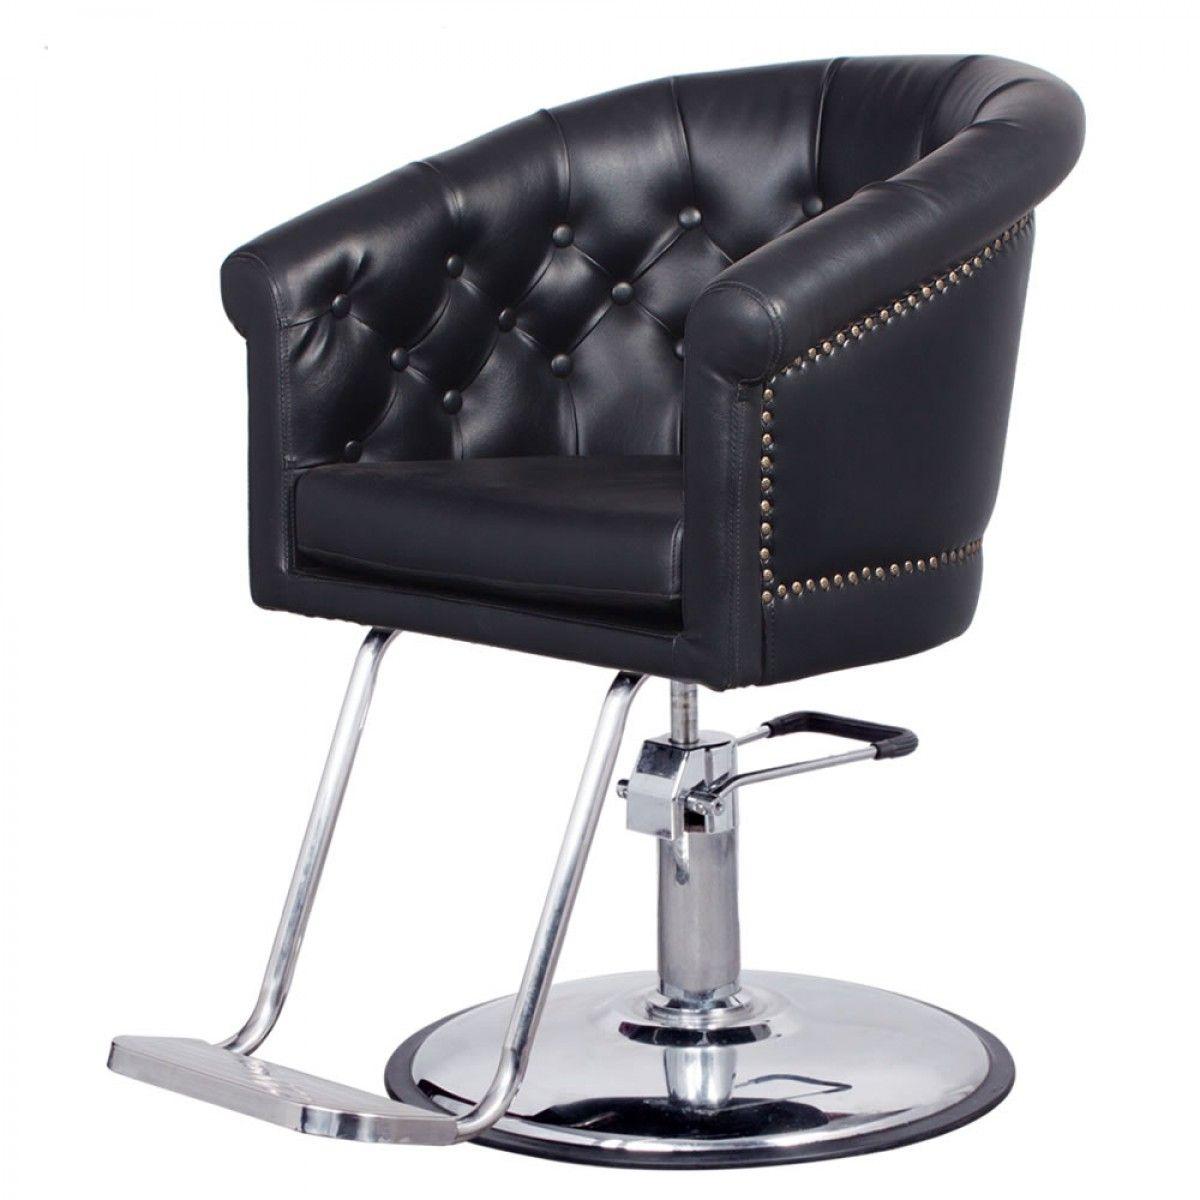 Vernazza Hair Salon Chairs Hair Styling Chairs Hairsalon Beautysalon Salonchairs Agsbeauty Agssalon Salon Styling Chairs Chairs For Sale Chair Style